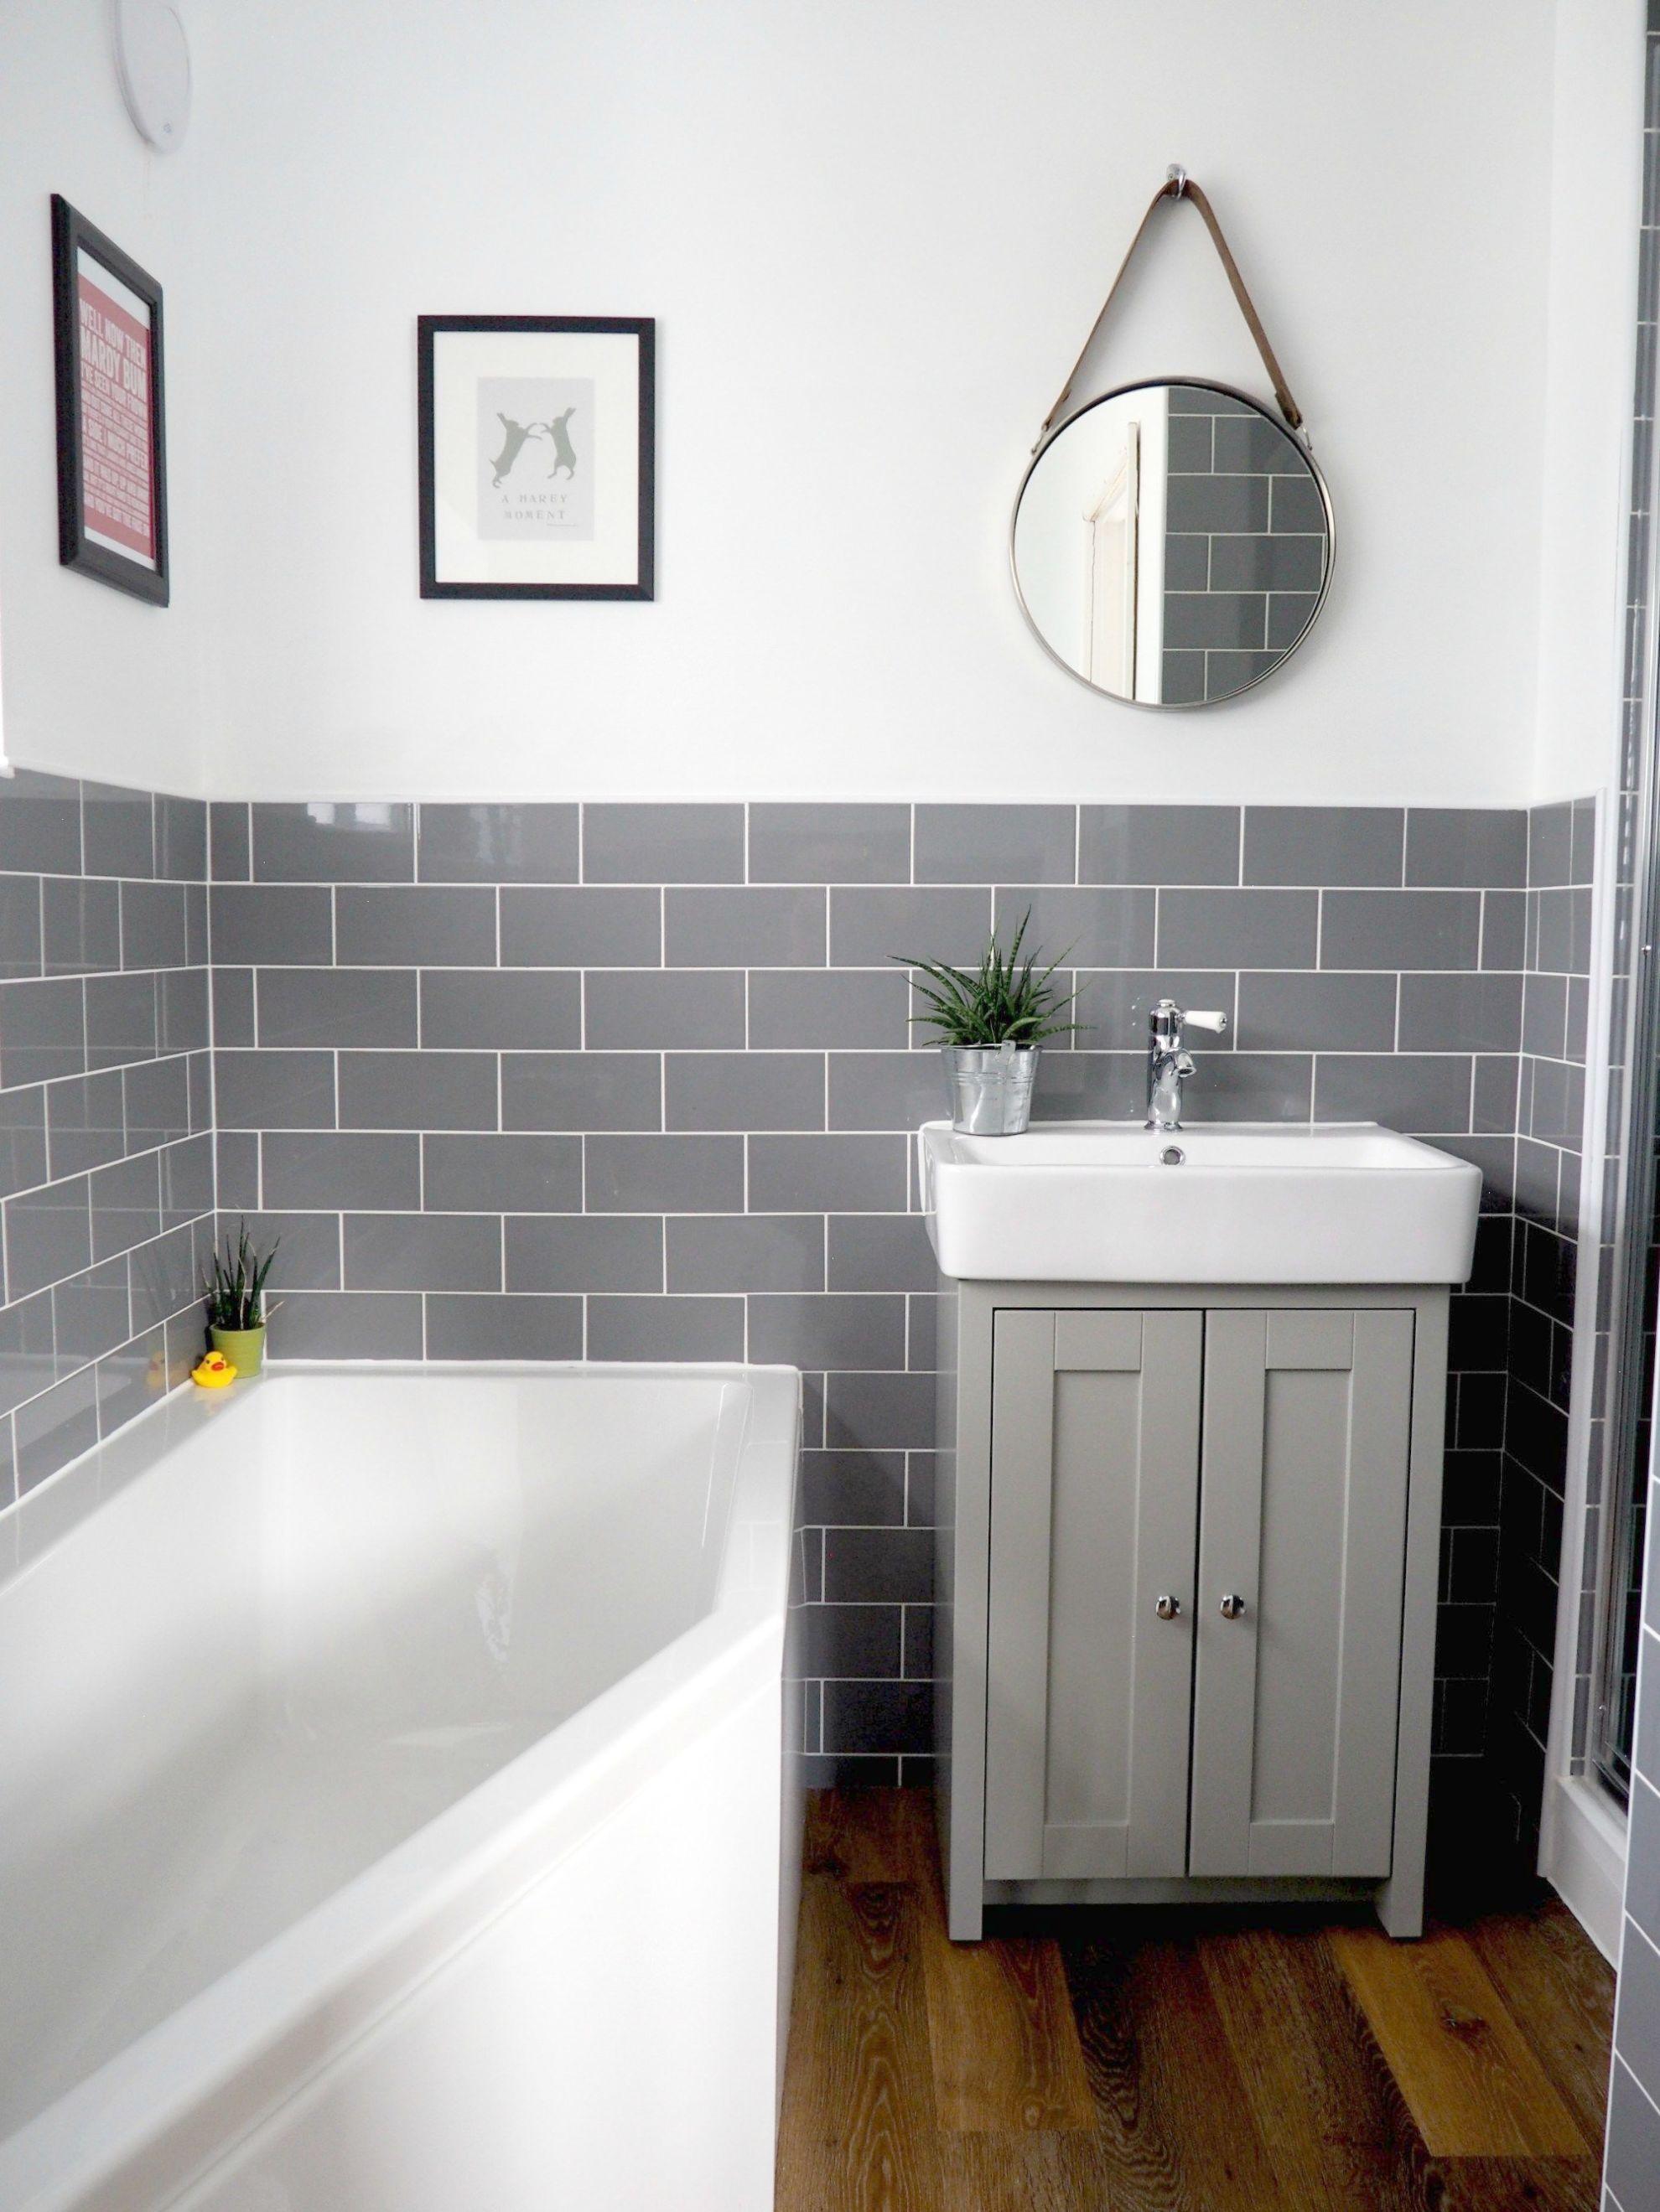 Bathroom Renovation Ideas Bathroom Remodel Cost Bathroom Ideas For Small